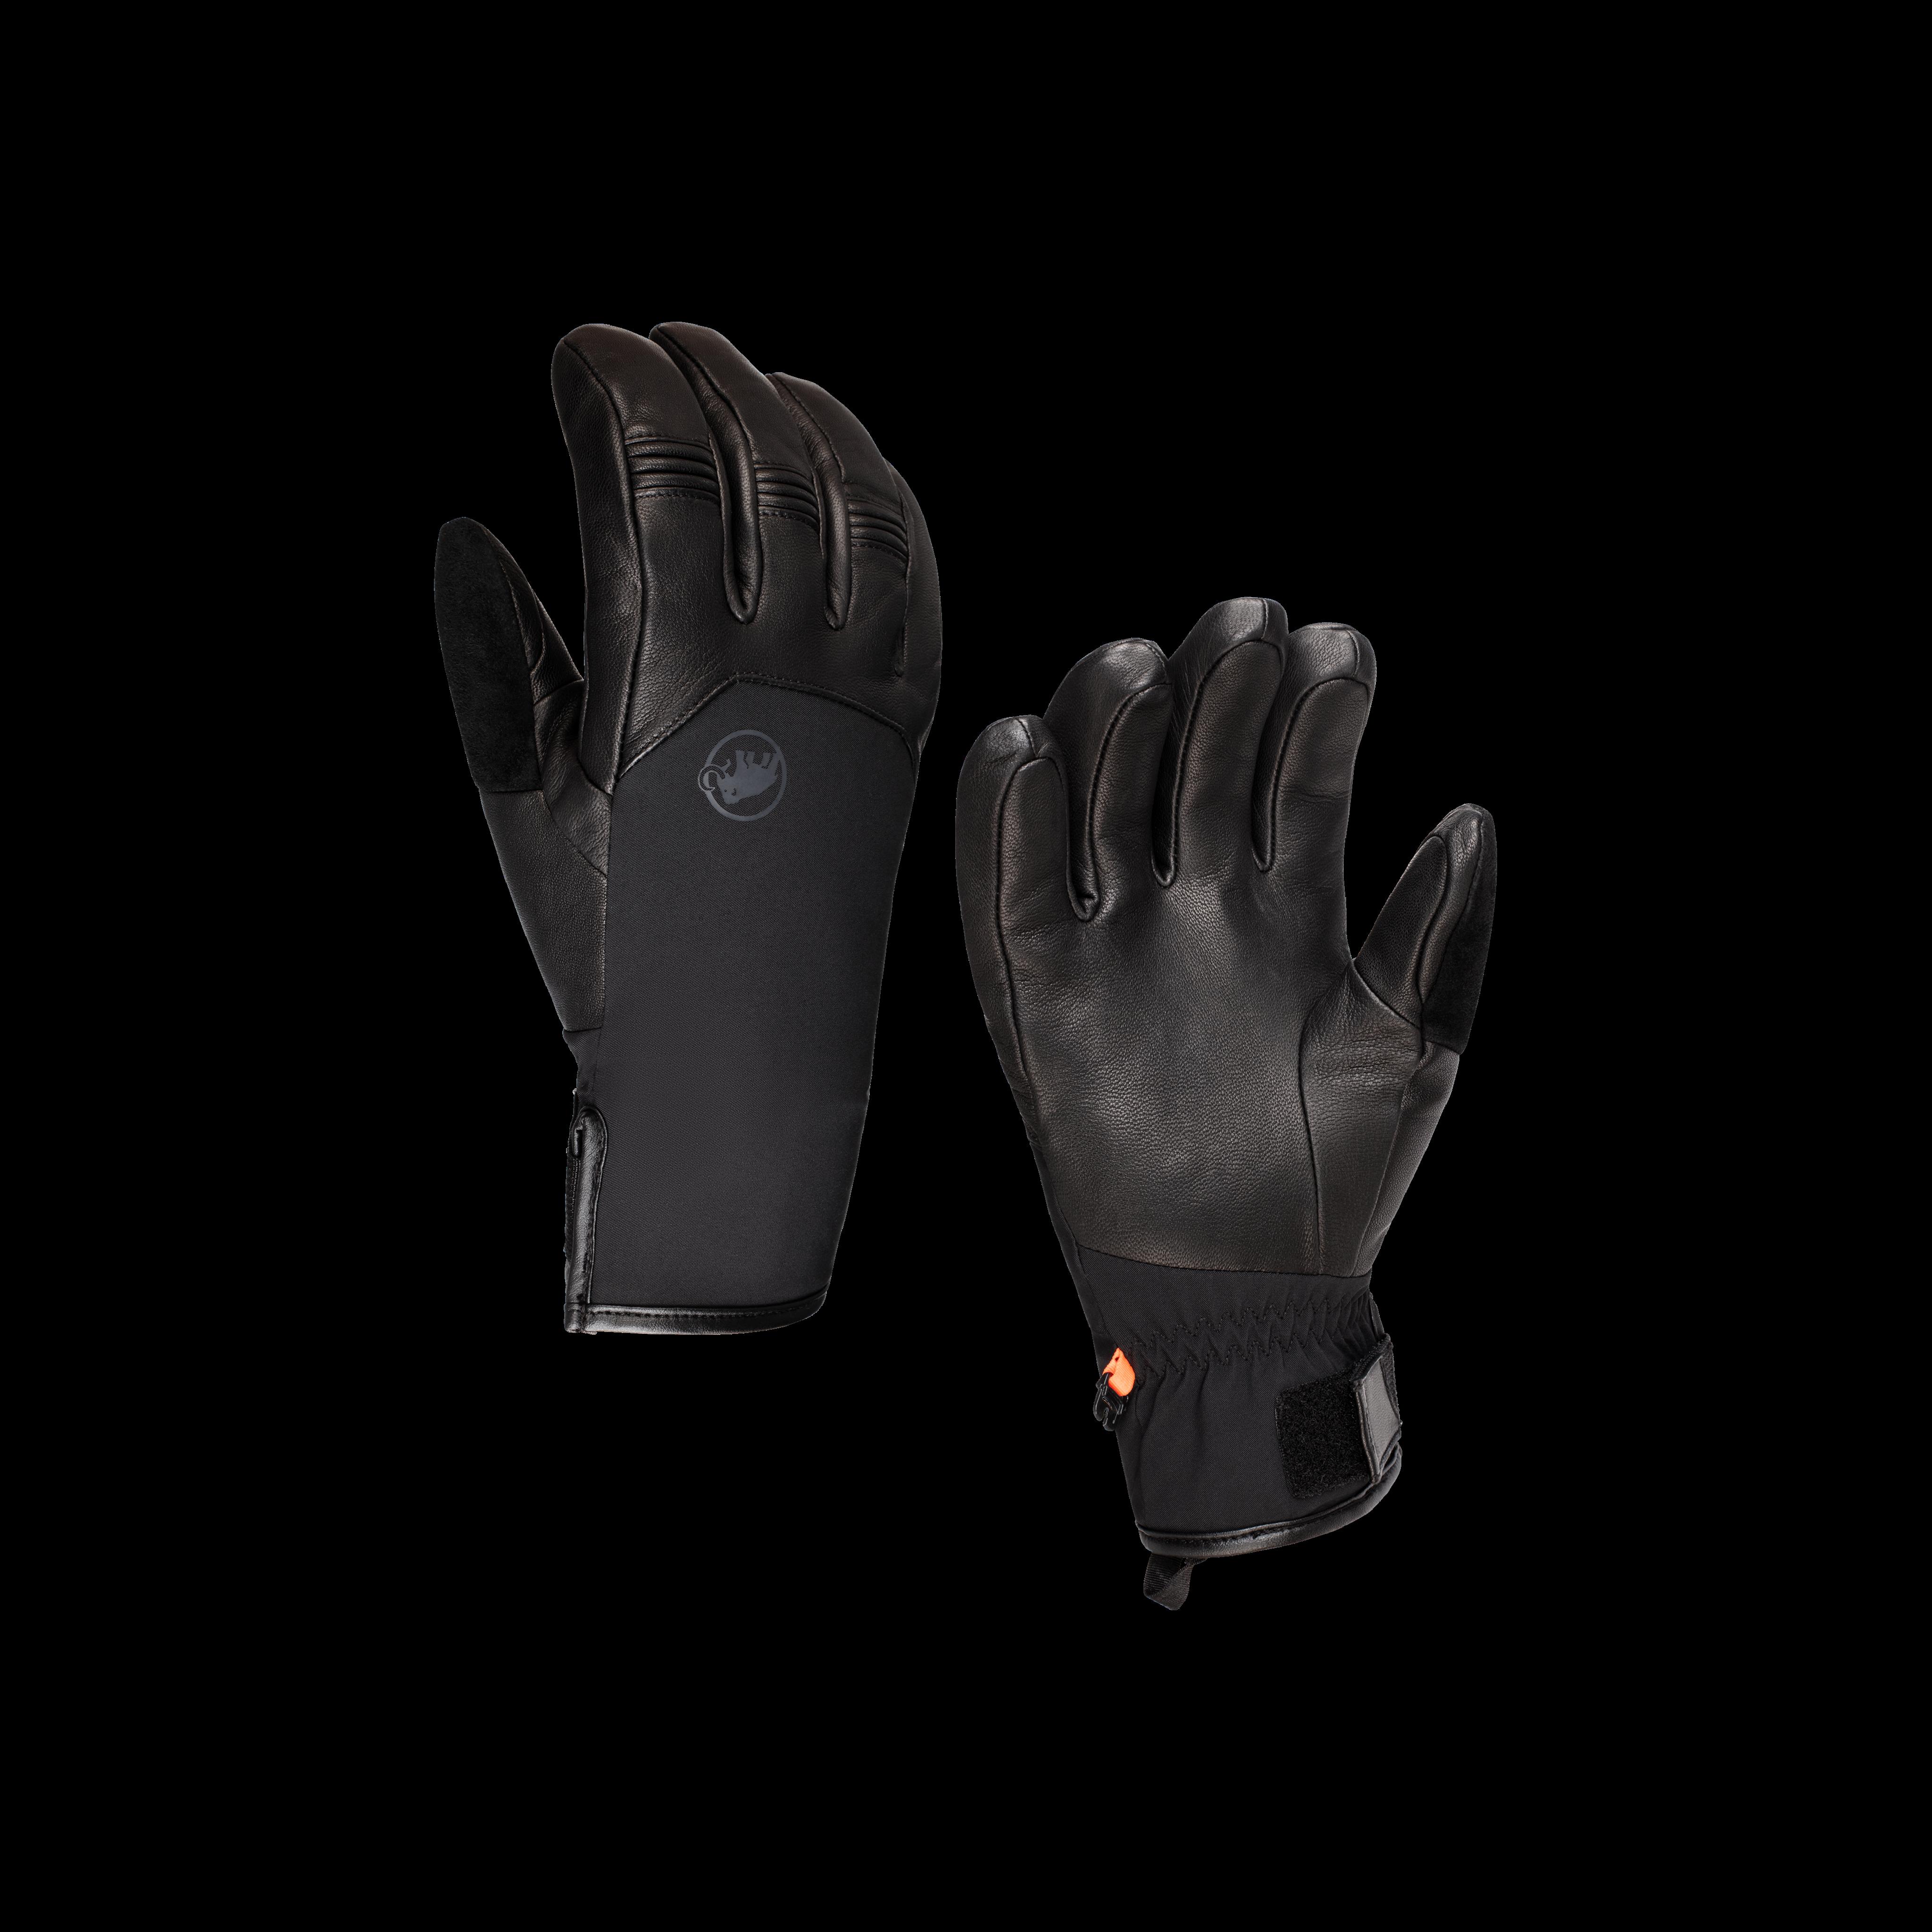 Stoney Glove - 9, black thumbnail